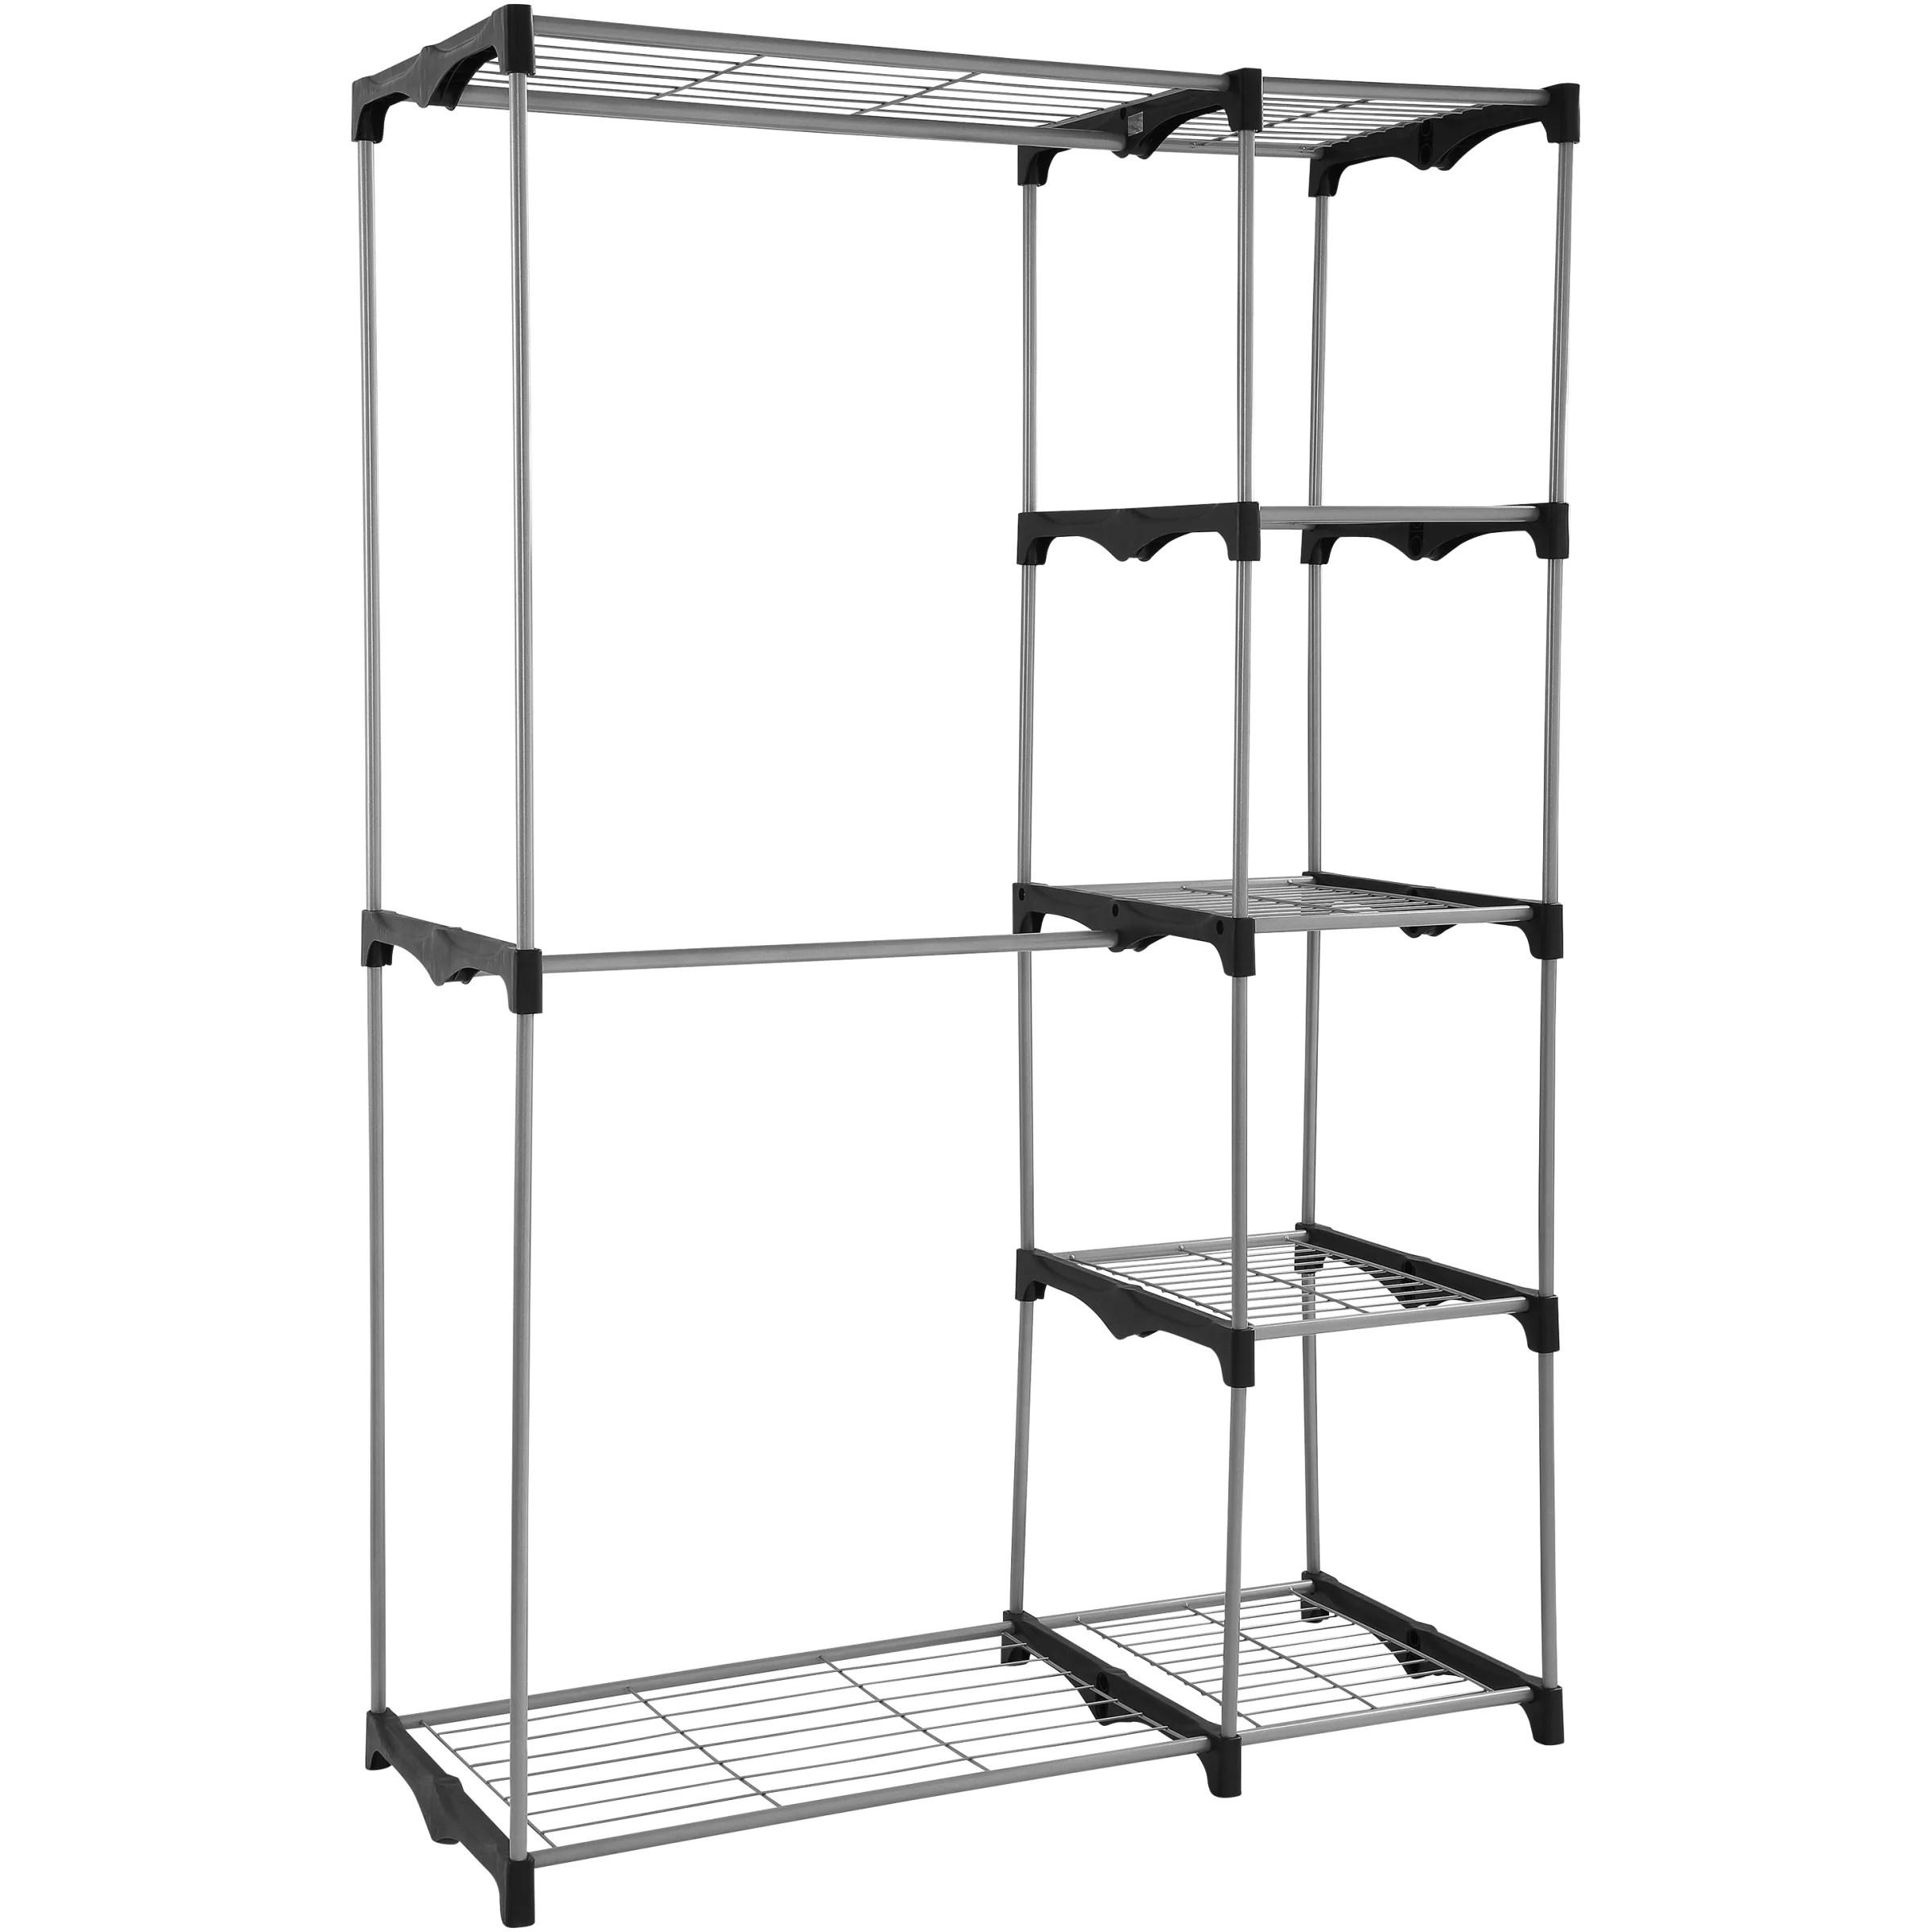 Mainstays Wire Shelf Closet Organizer, 2-Tier, Easy to